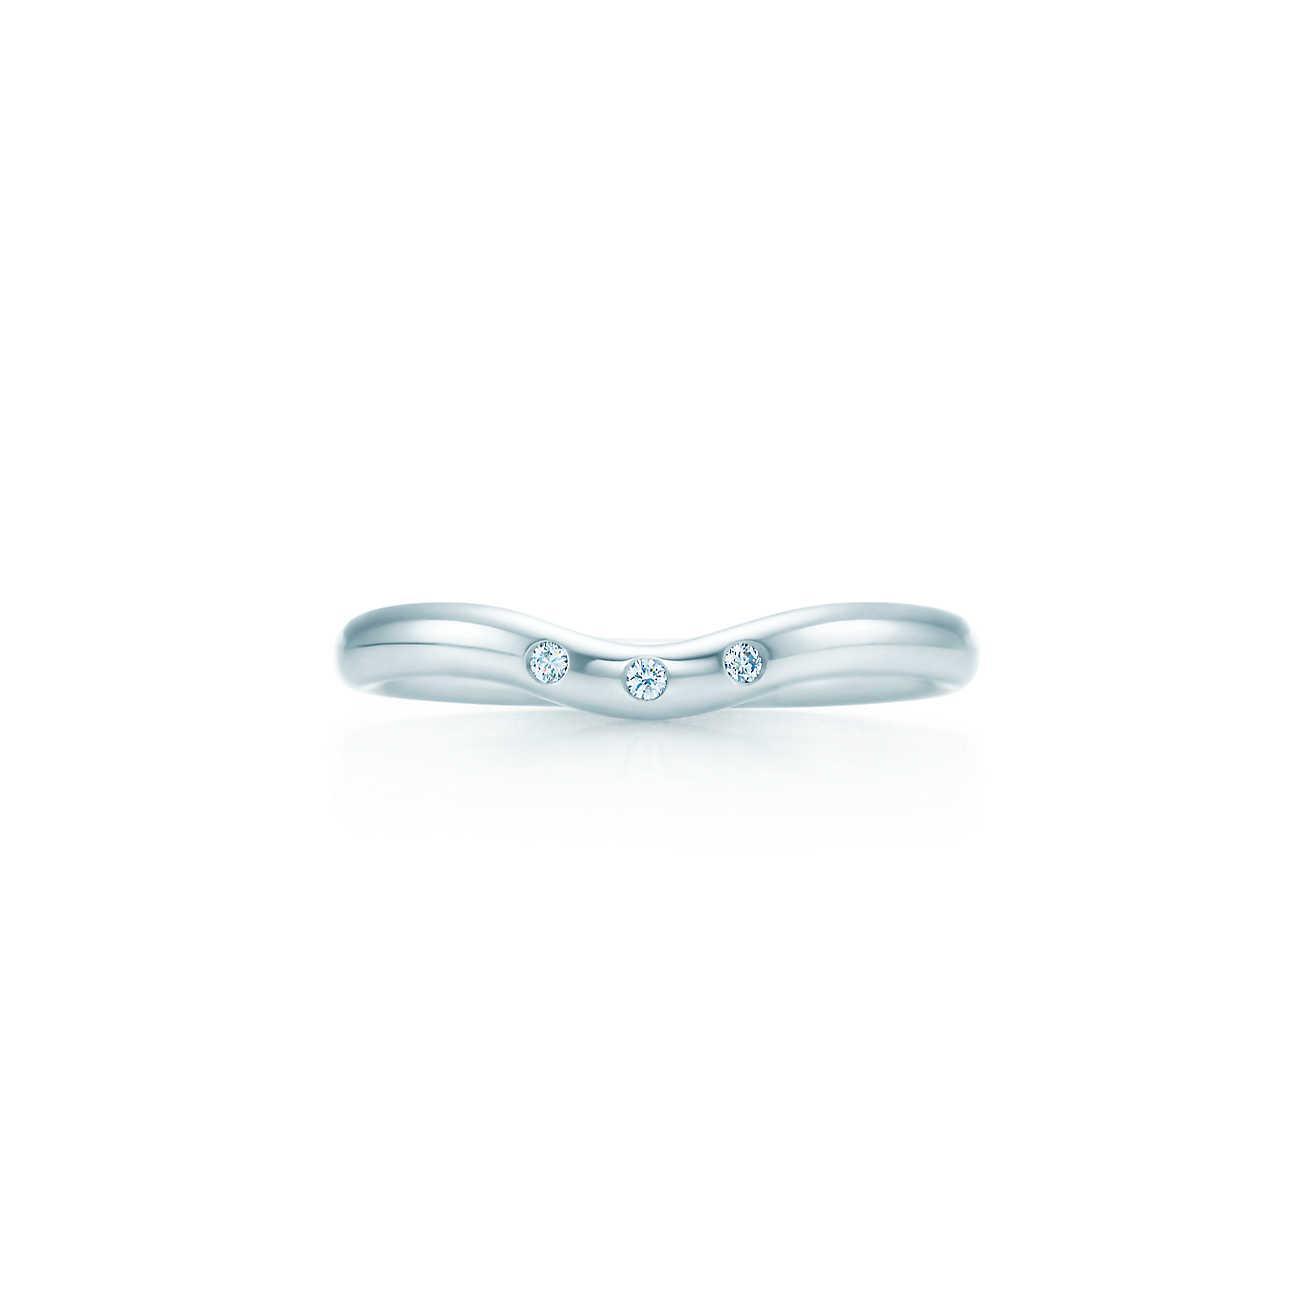 Elsa Peretti Full Heart ring in sterling silver, 11 mm wide - Size 6 1/2 Tiffany & Co.